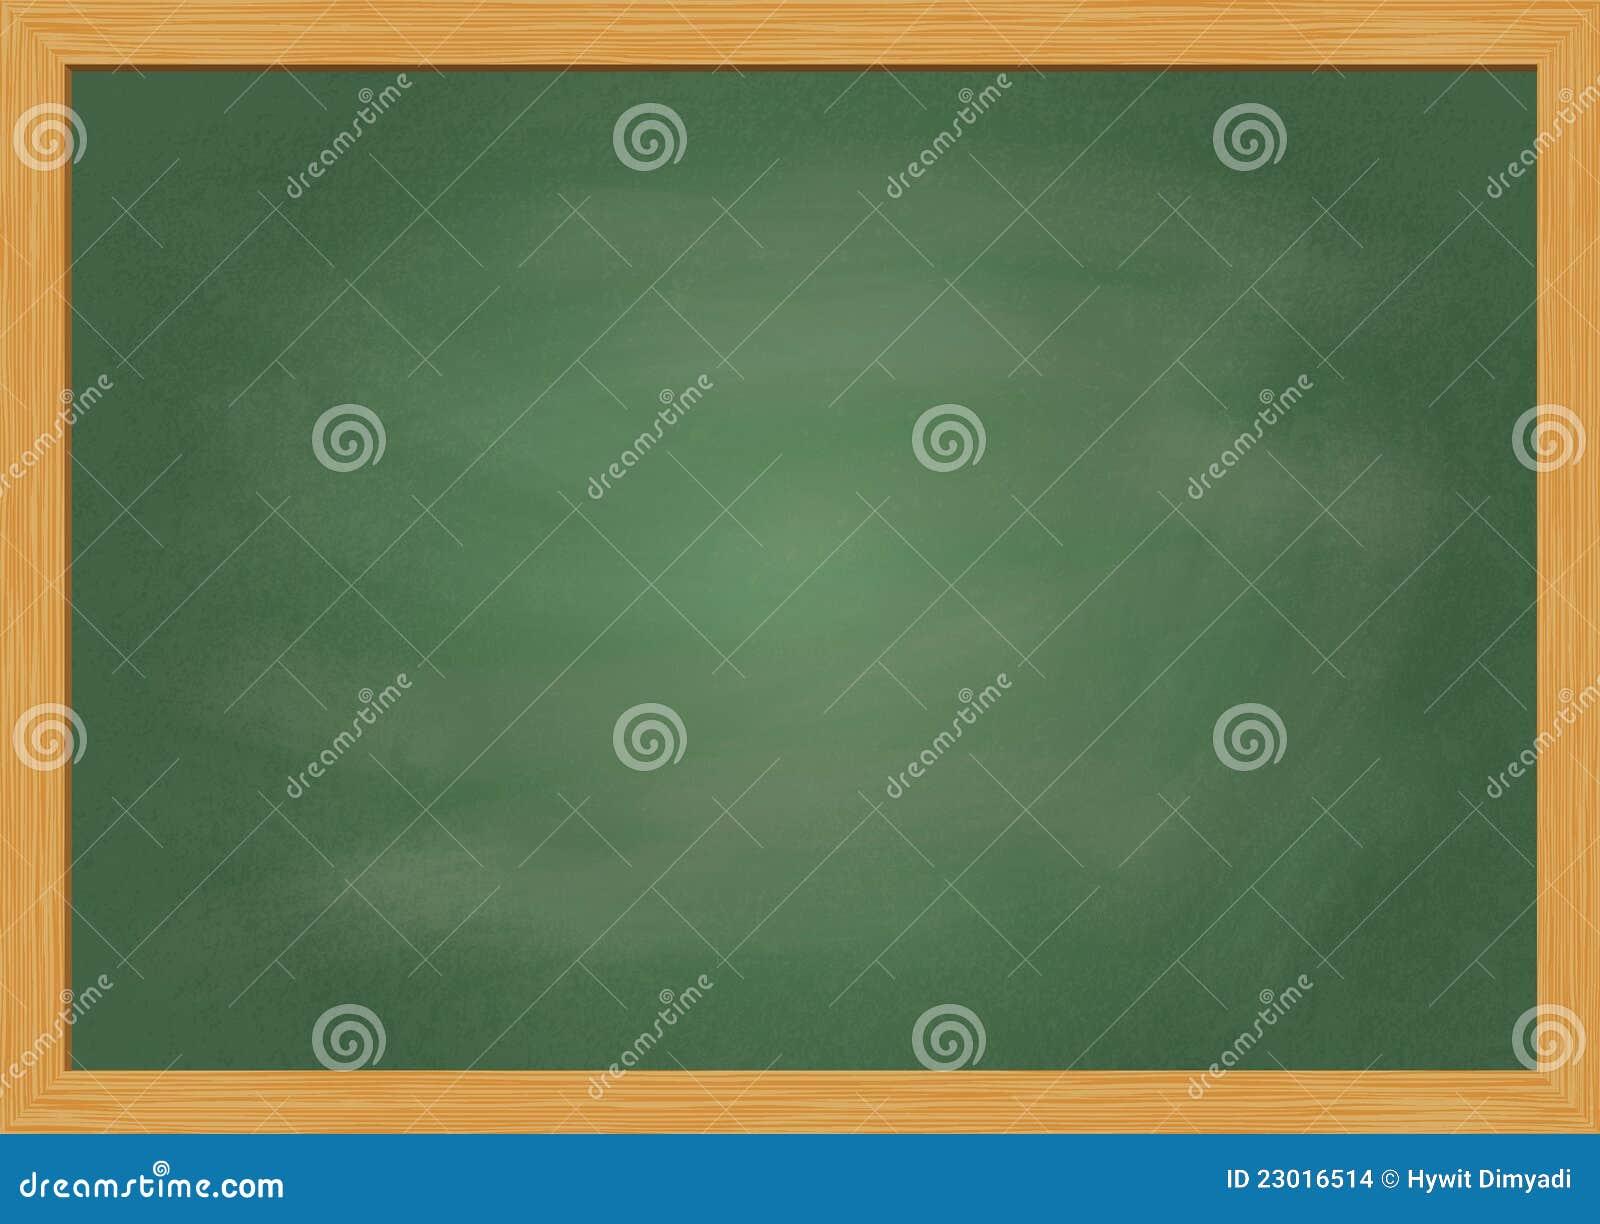 Lege schoolbordillustratie